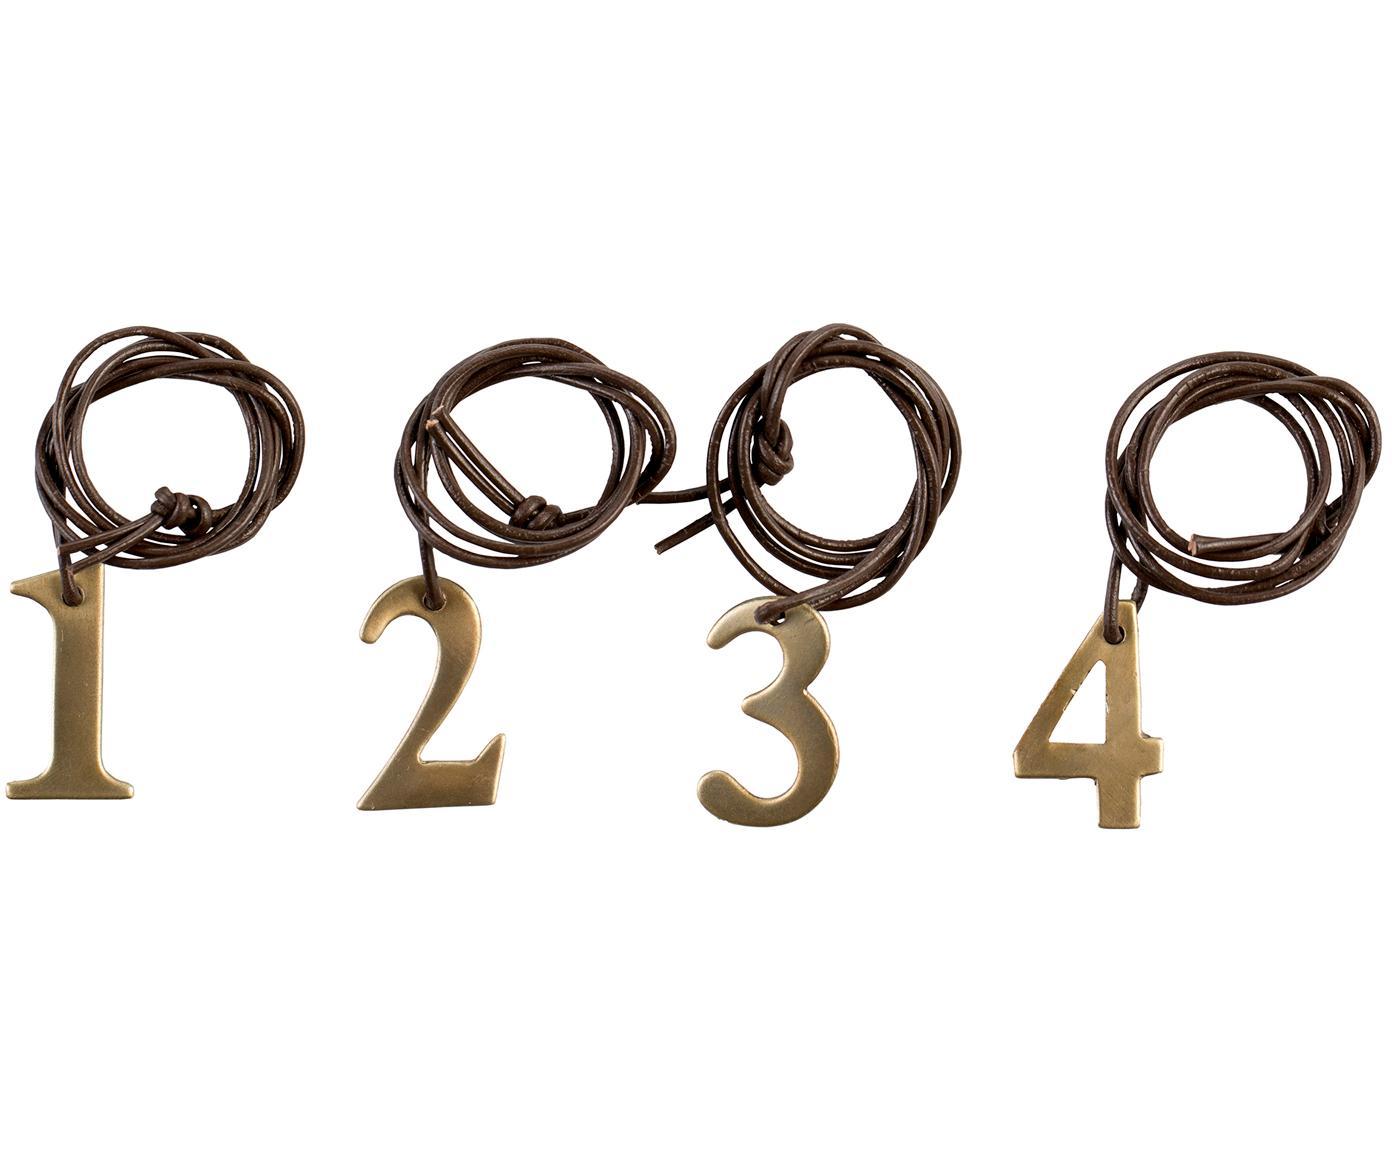 Kaarshangersset Dana Advent Number, 4-delig, Messingkleurig, bruin, 2 x 3 cm